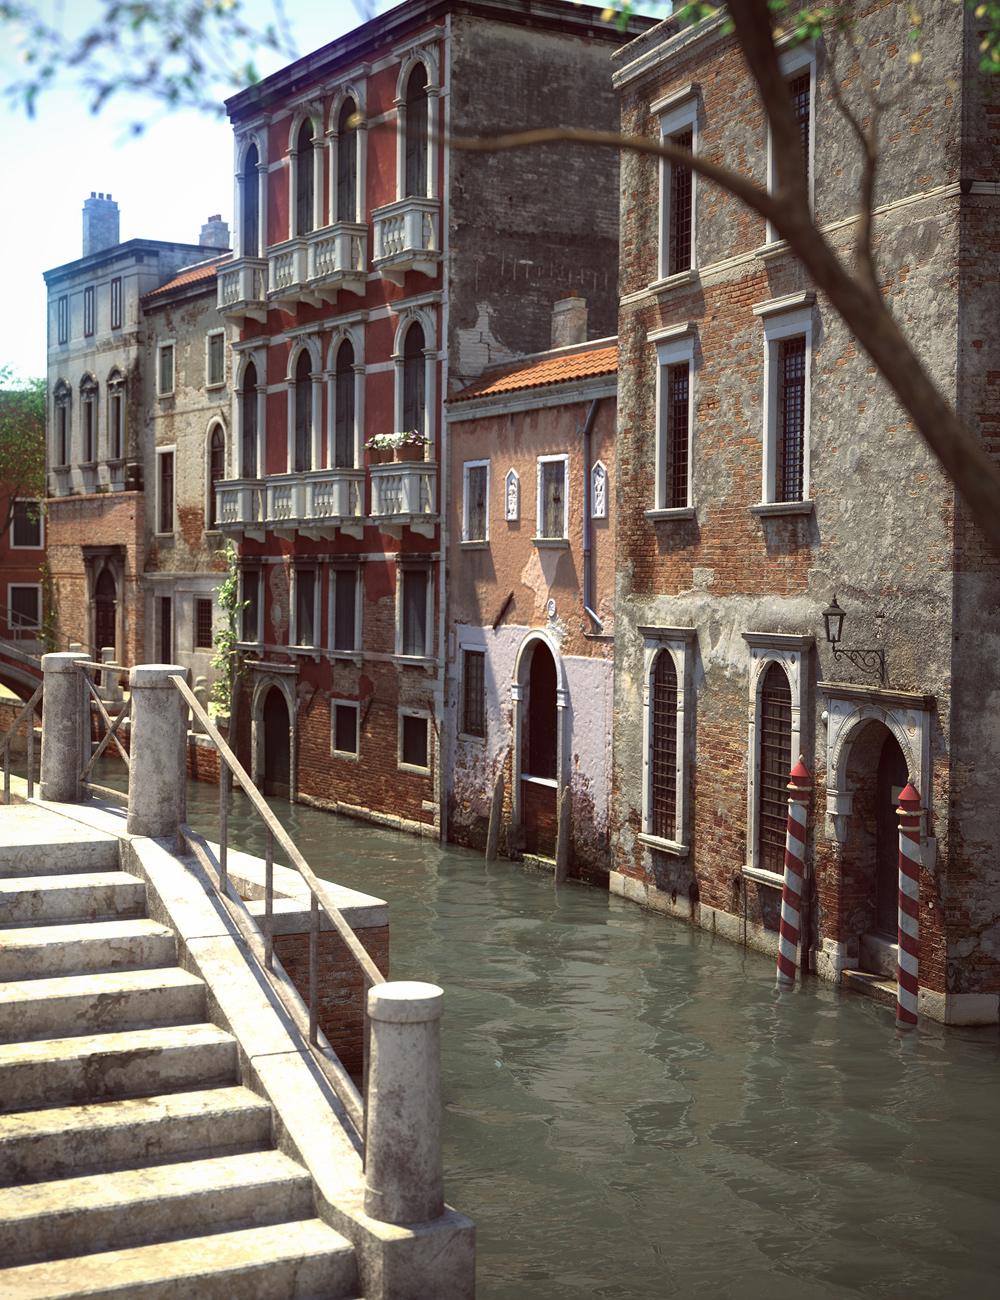 The Streets Of Venice by: Stonemason, 3D Models by Daz 3D